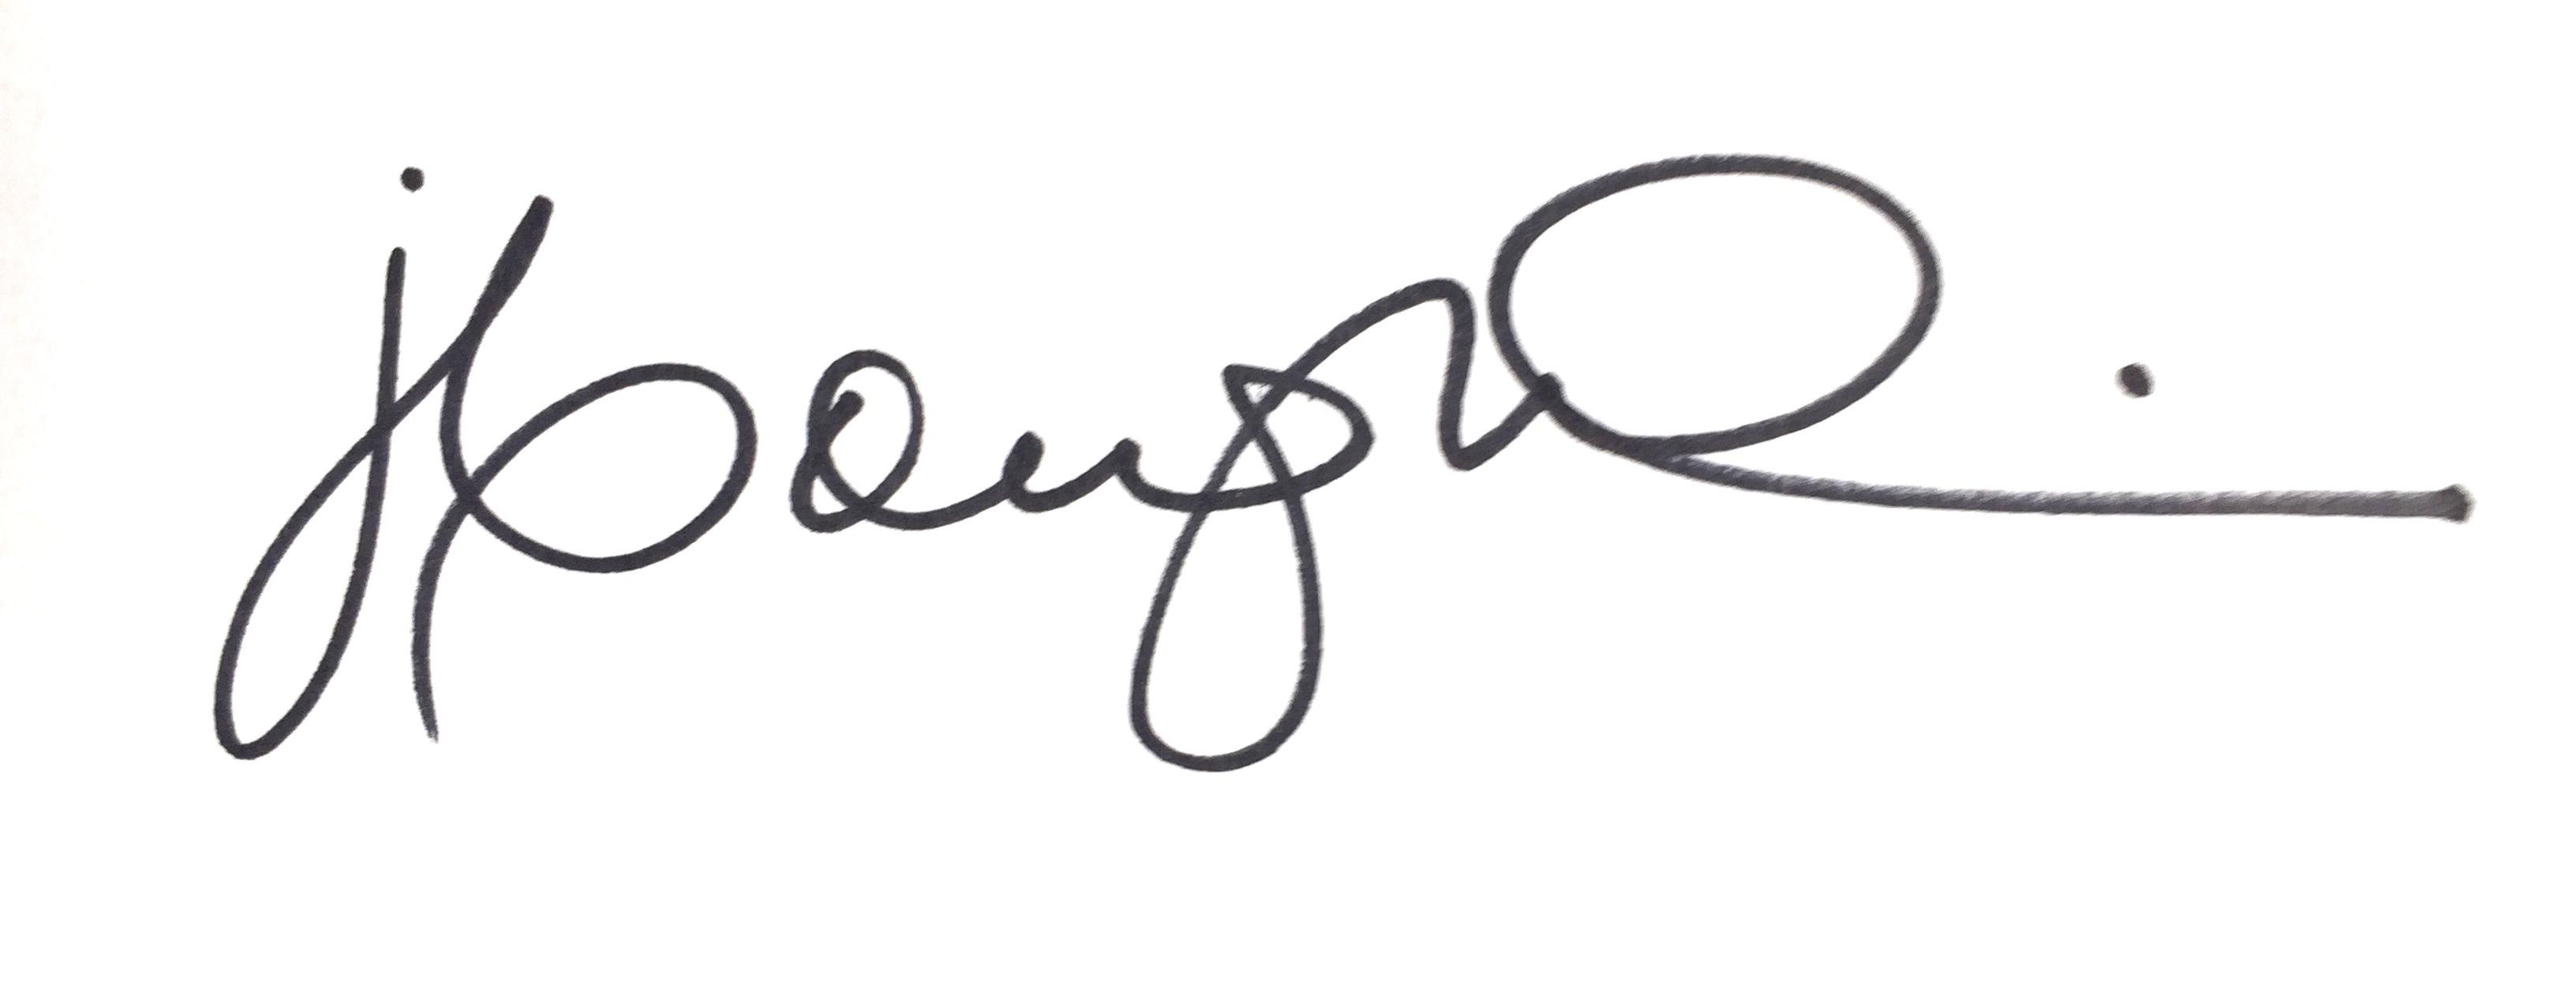 Joanne coughlin's Signature